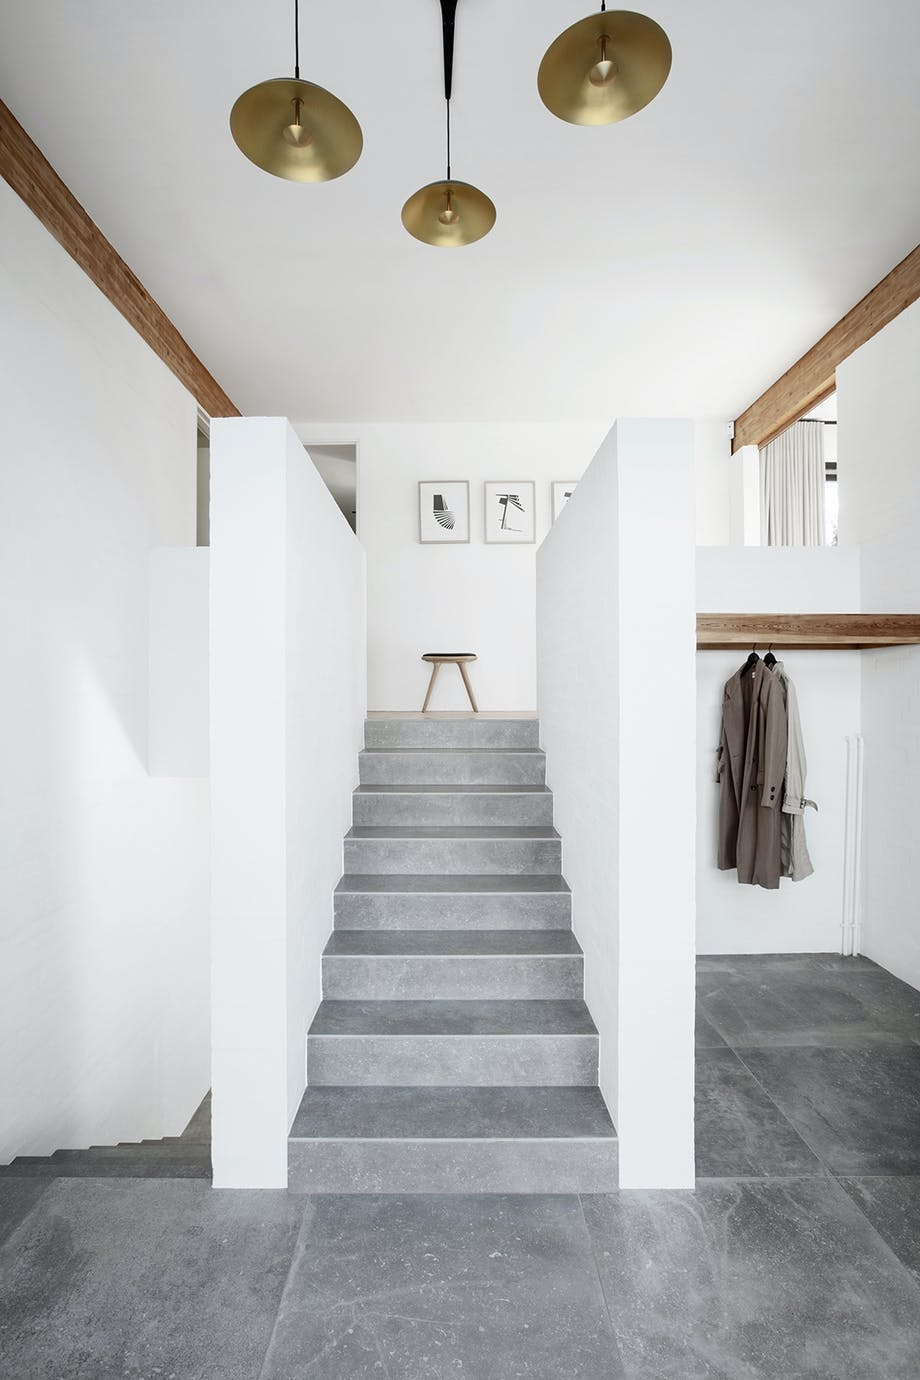 Entre loftsbjælke grå keramiske gulvfliser